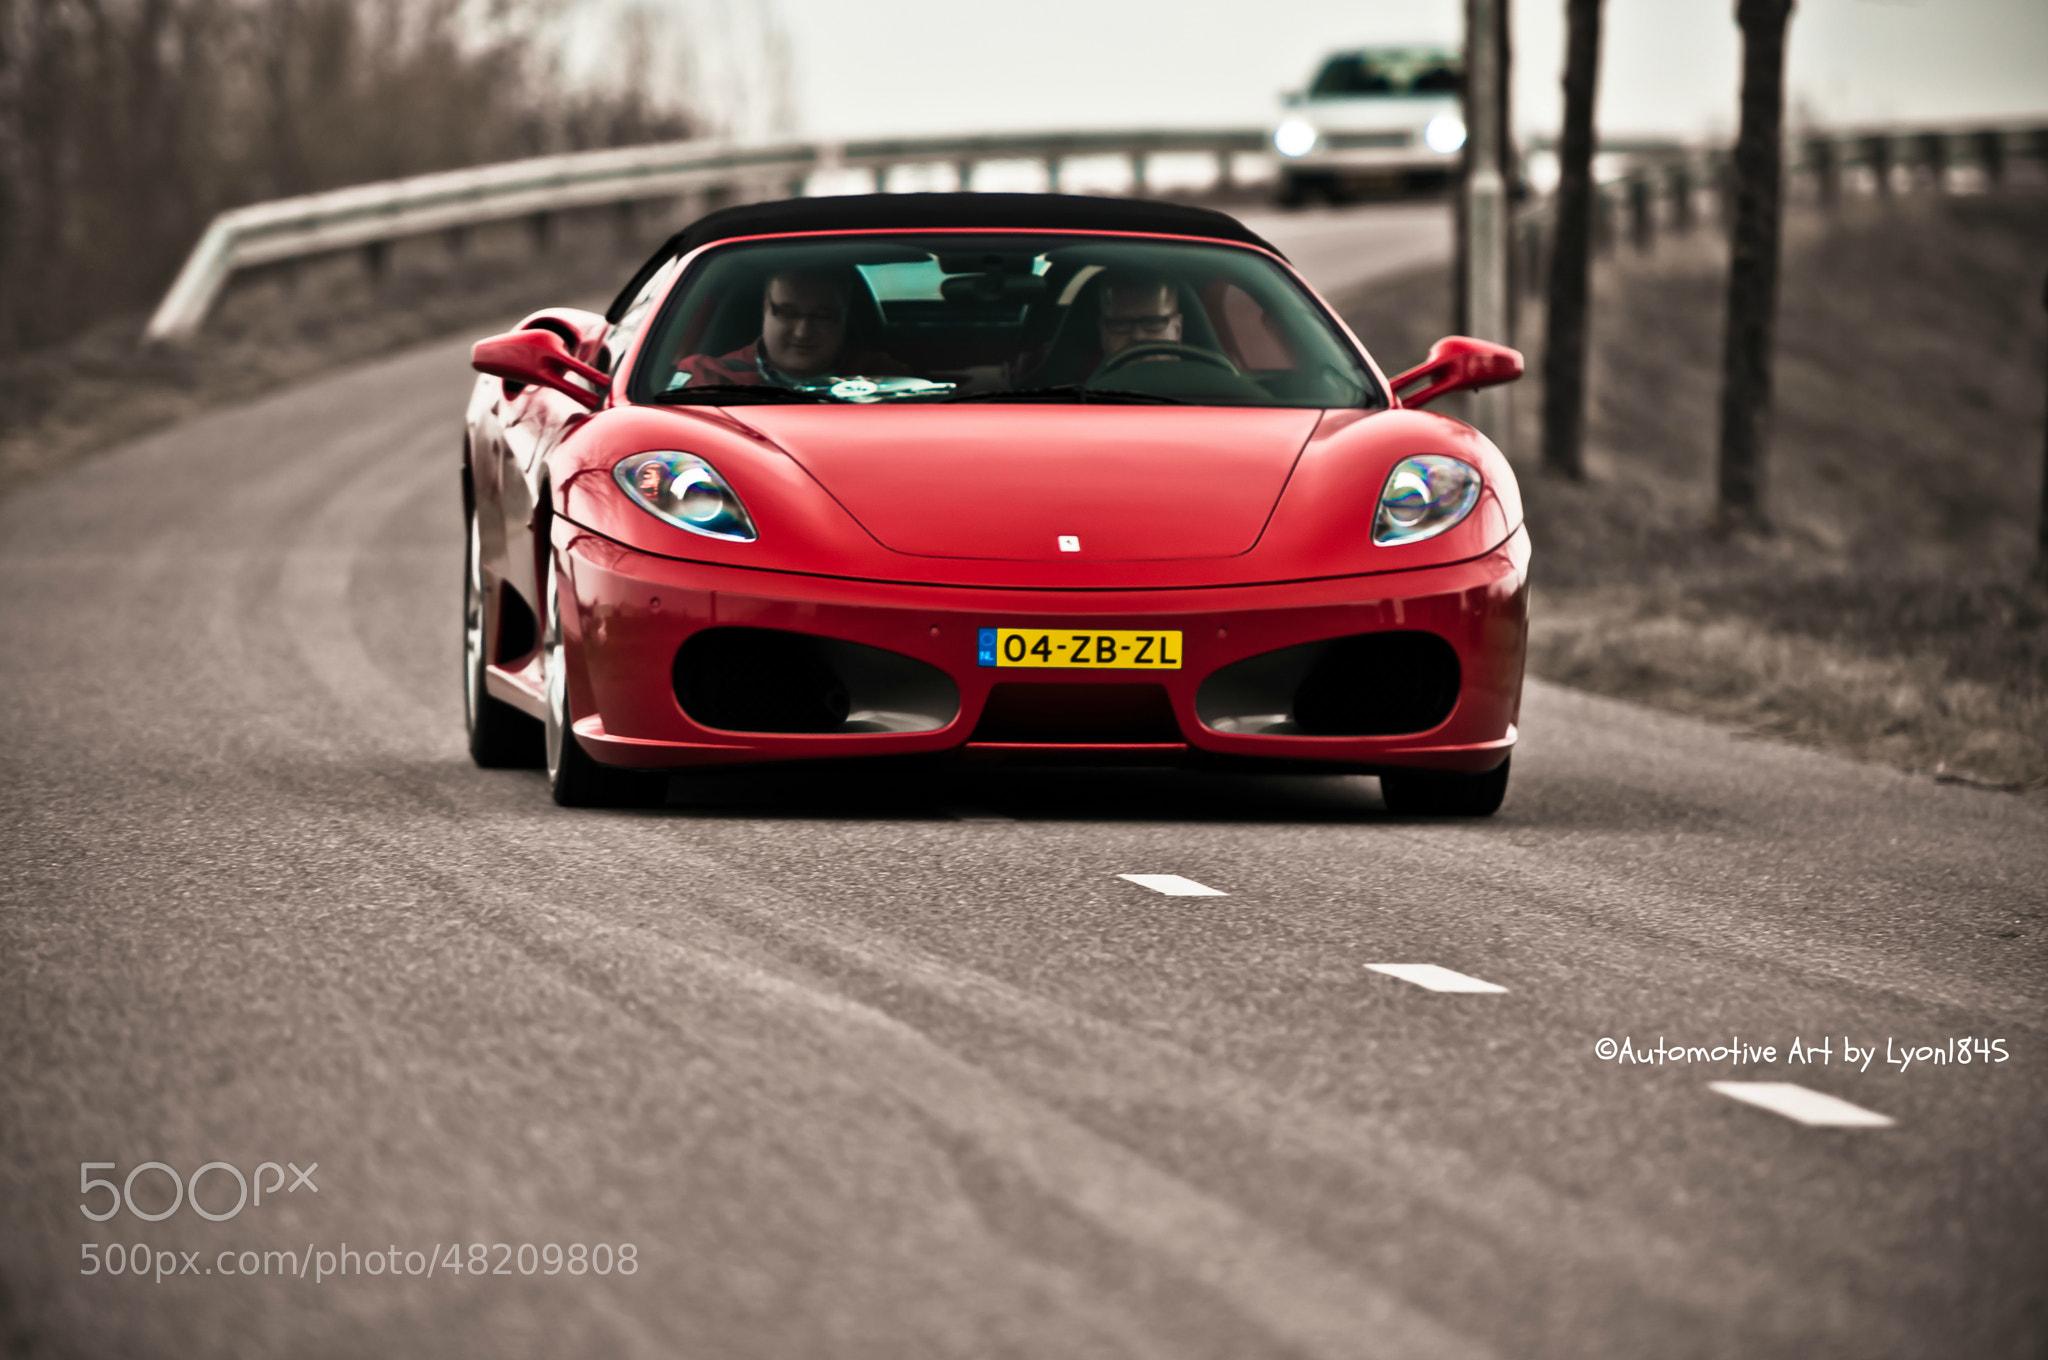 Photograph Ferrari F430 Spider by lyon1845 on 500px